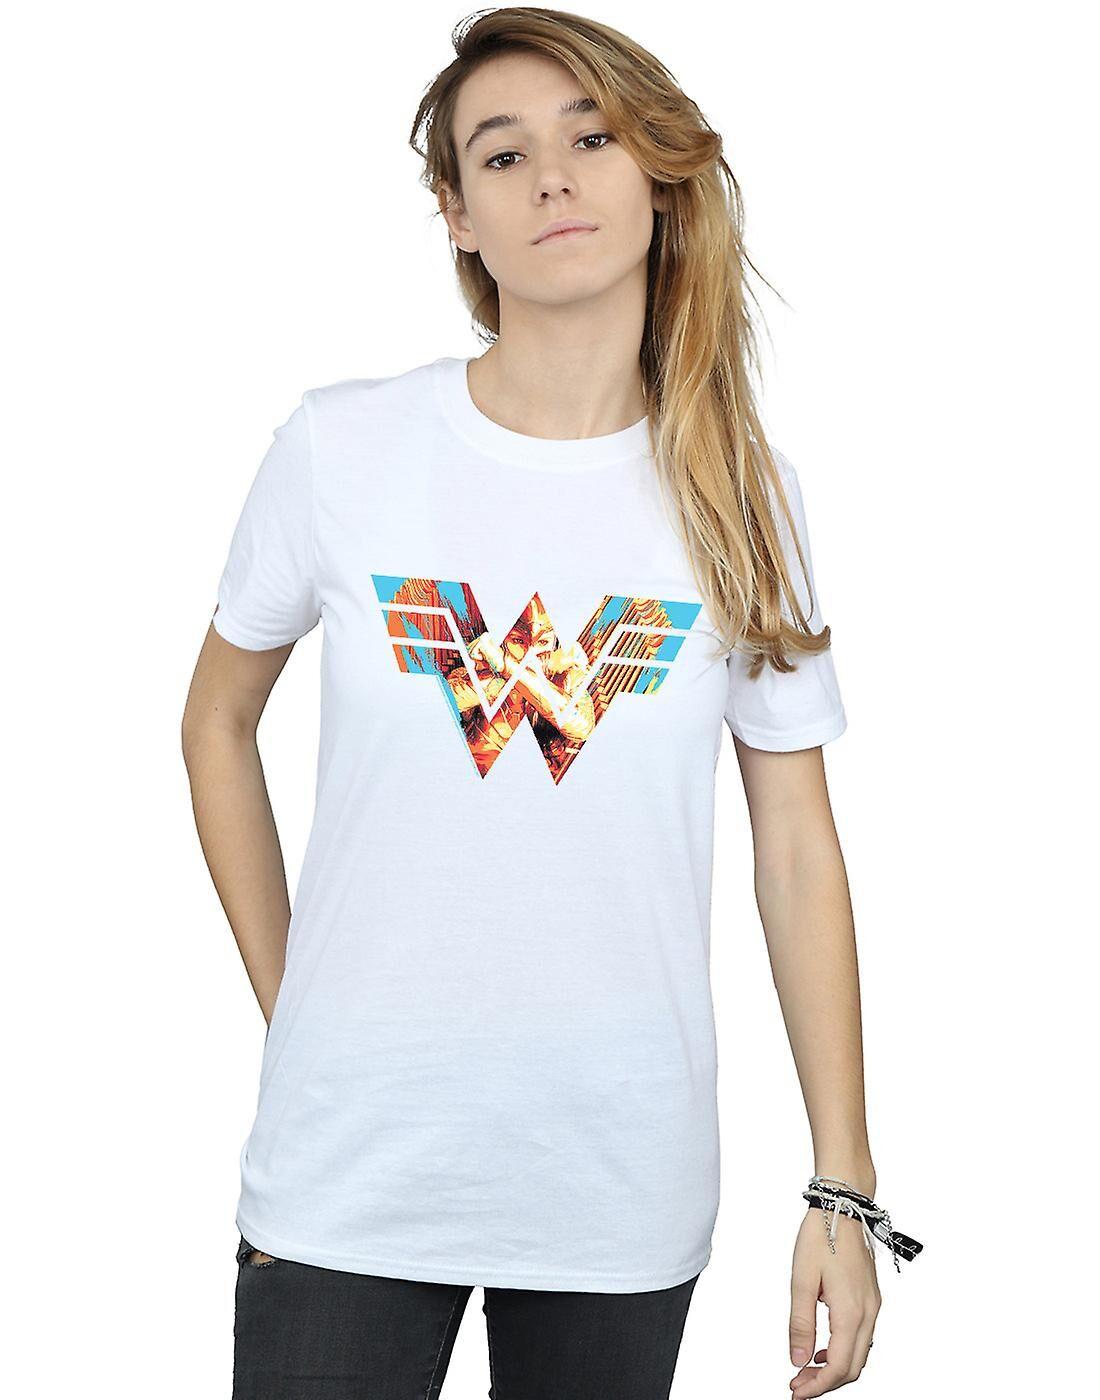 Absolute Cult DC Comics Femmes-apos;s Wonder Woman 84 Symbol Crossed Arms Boyfriend Fit T-Shirt Blanc Large